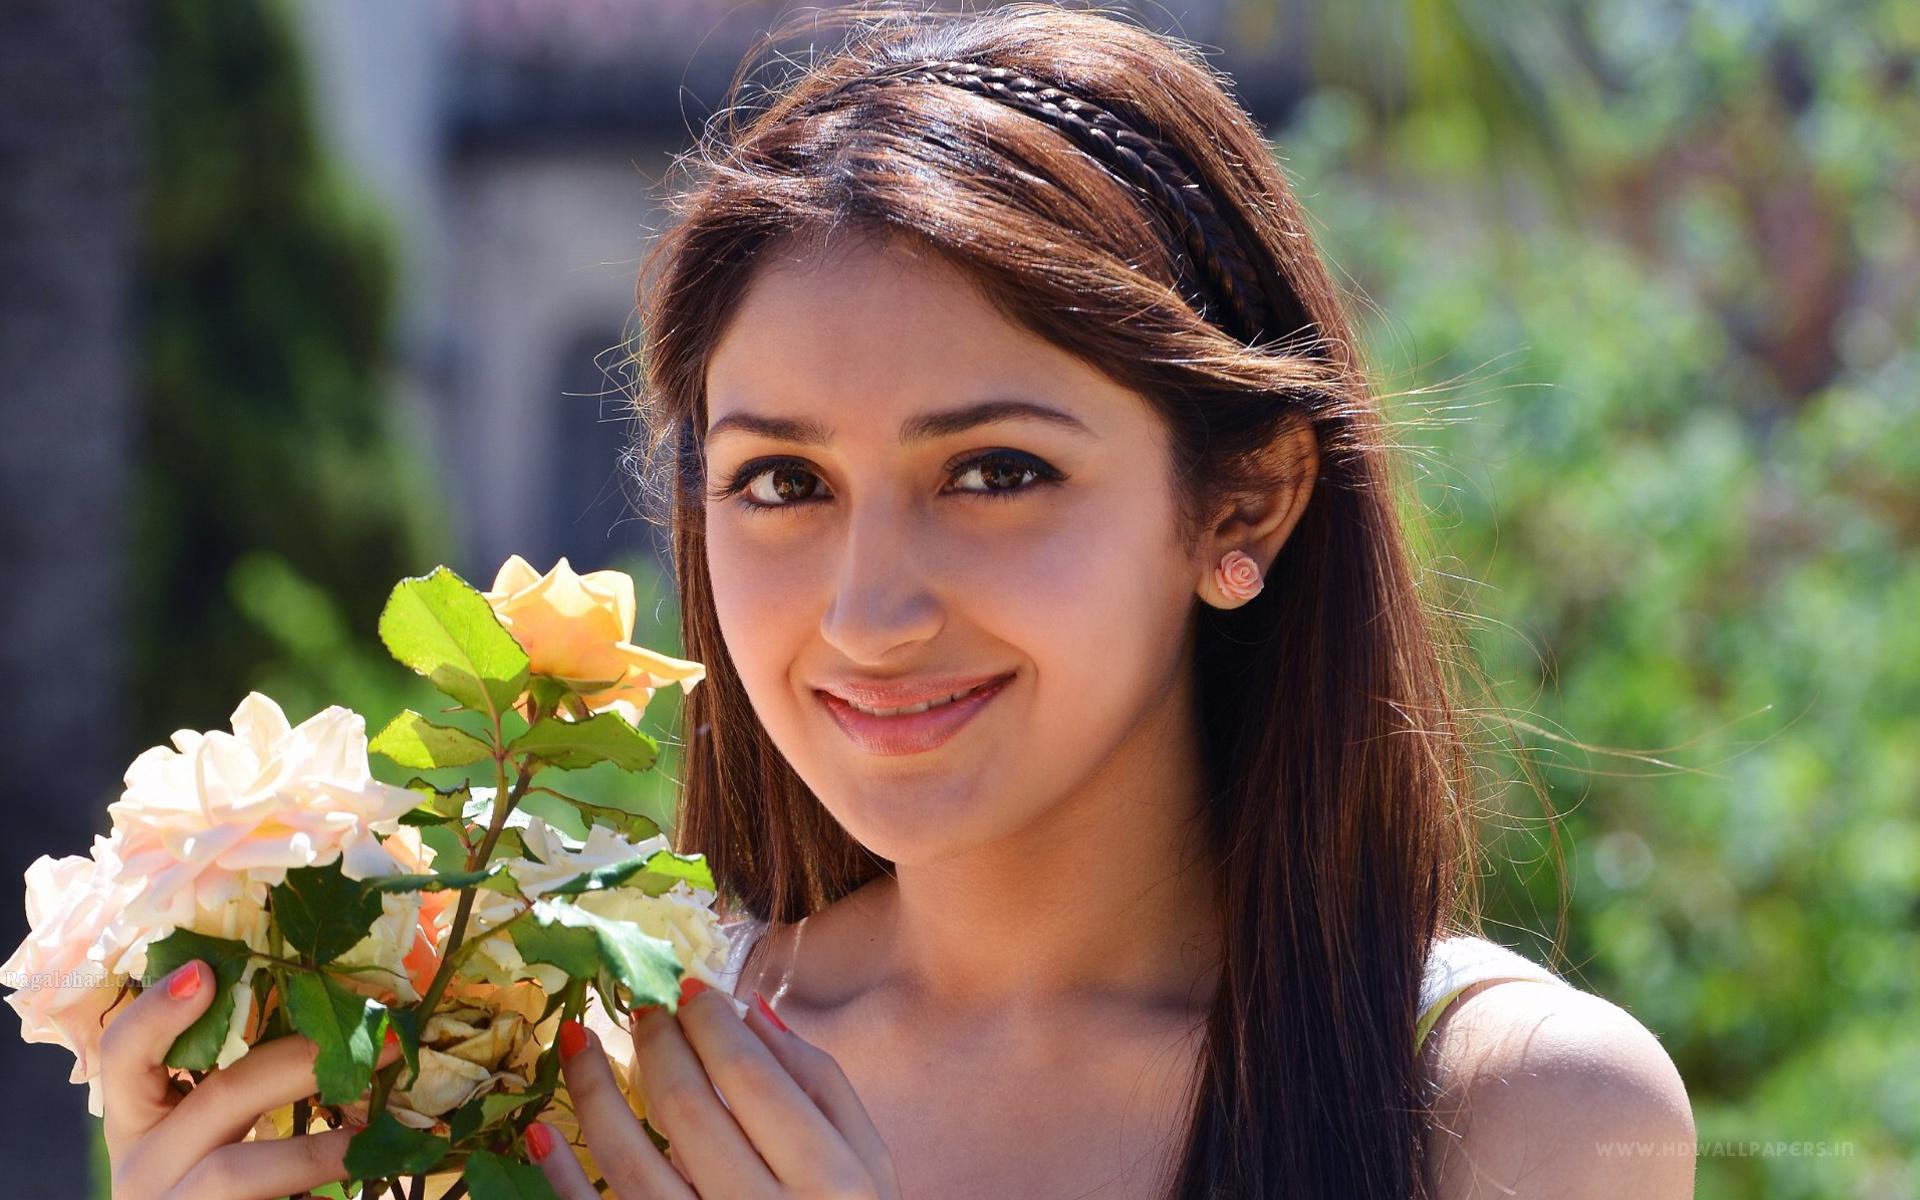 Telugu Actress Anushka Wallpapers in jpg format for free download